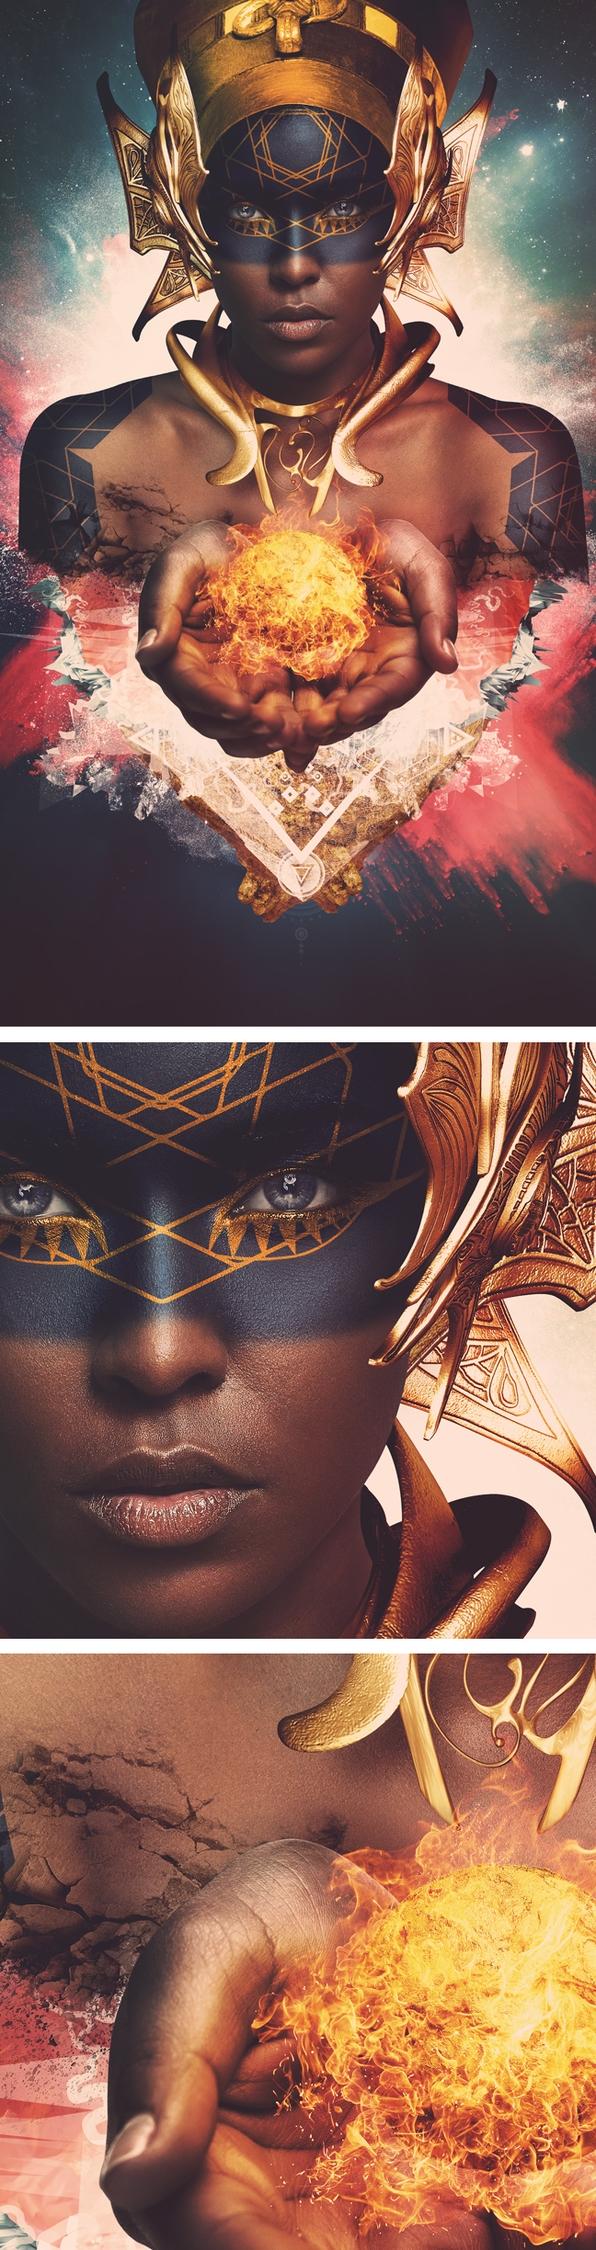 """BIRTH"" Sci-Fi series. inspired - urksdesign | ello"